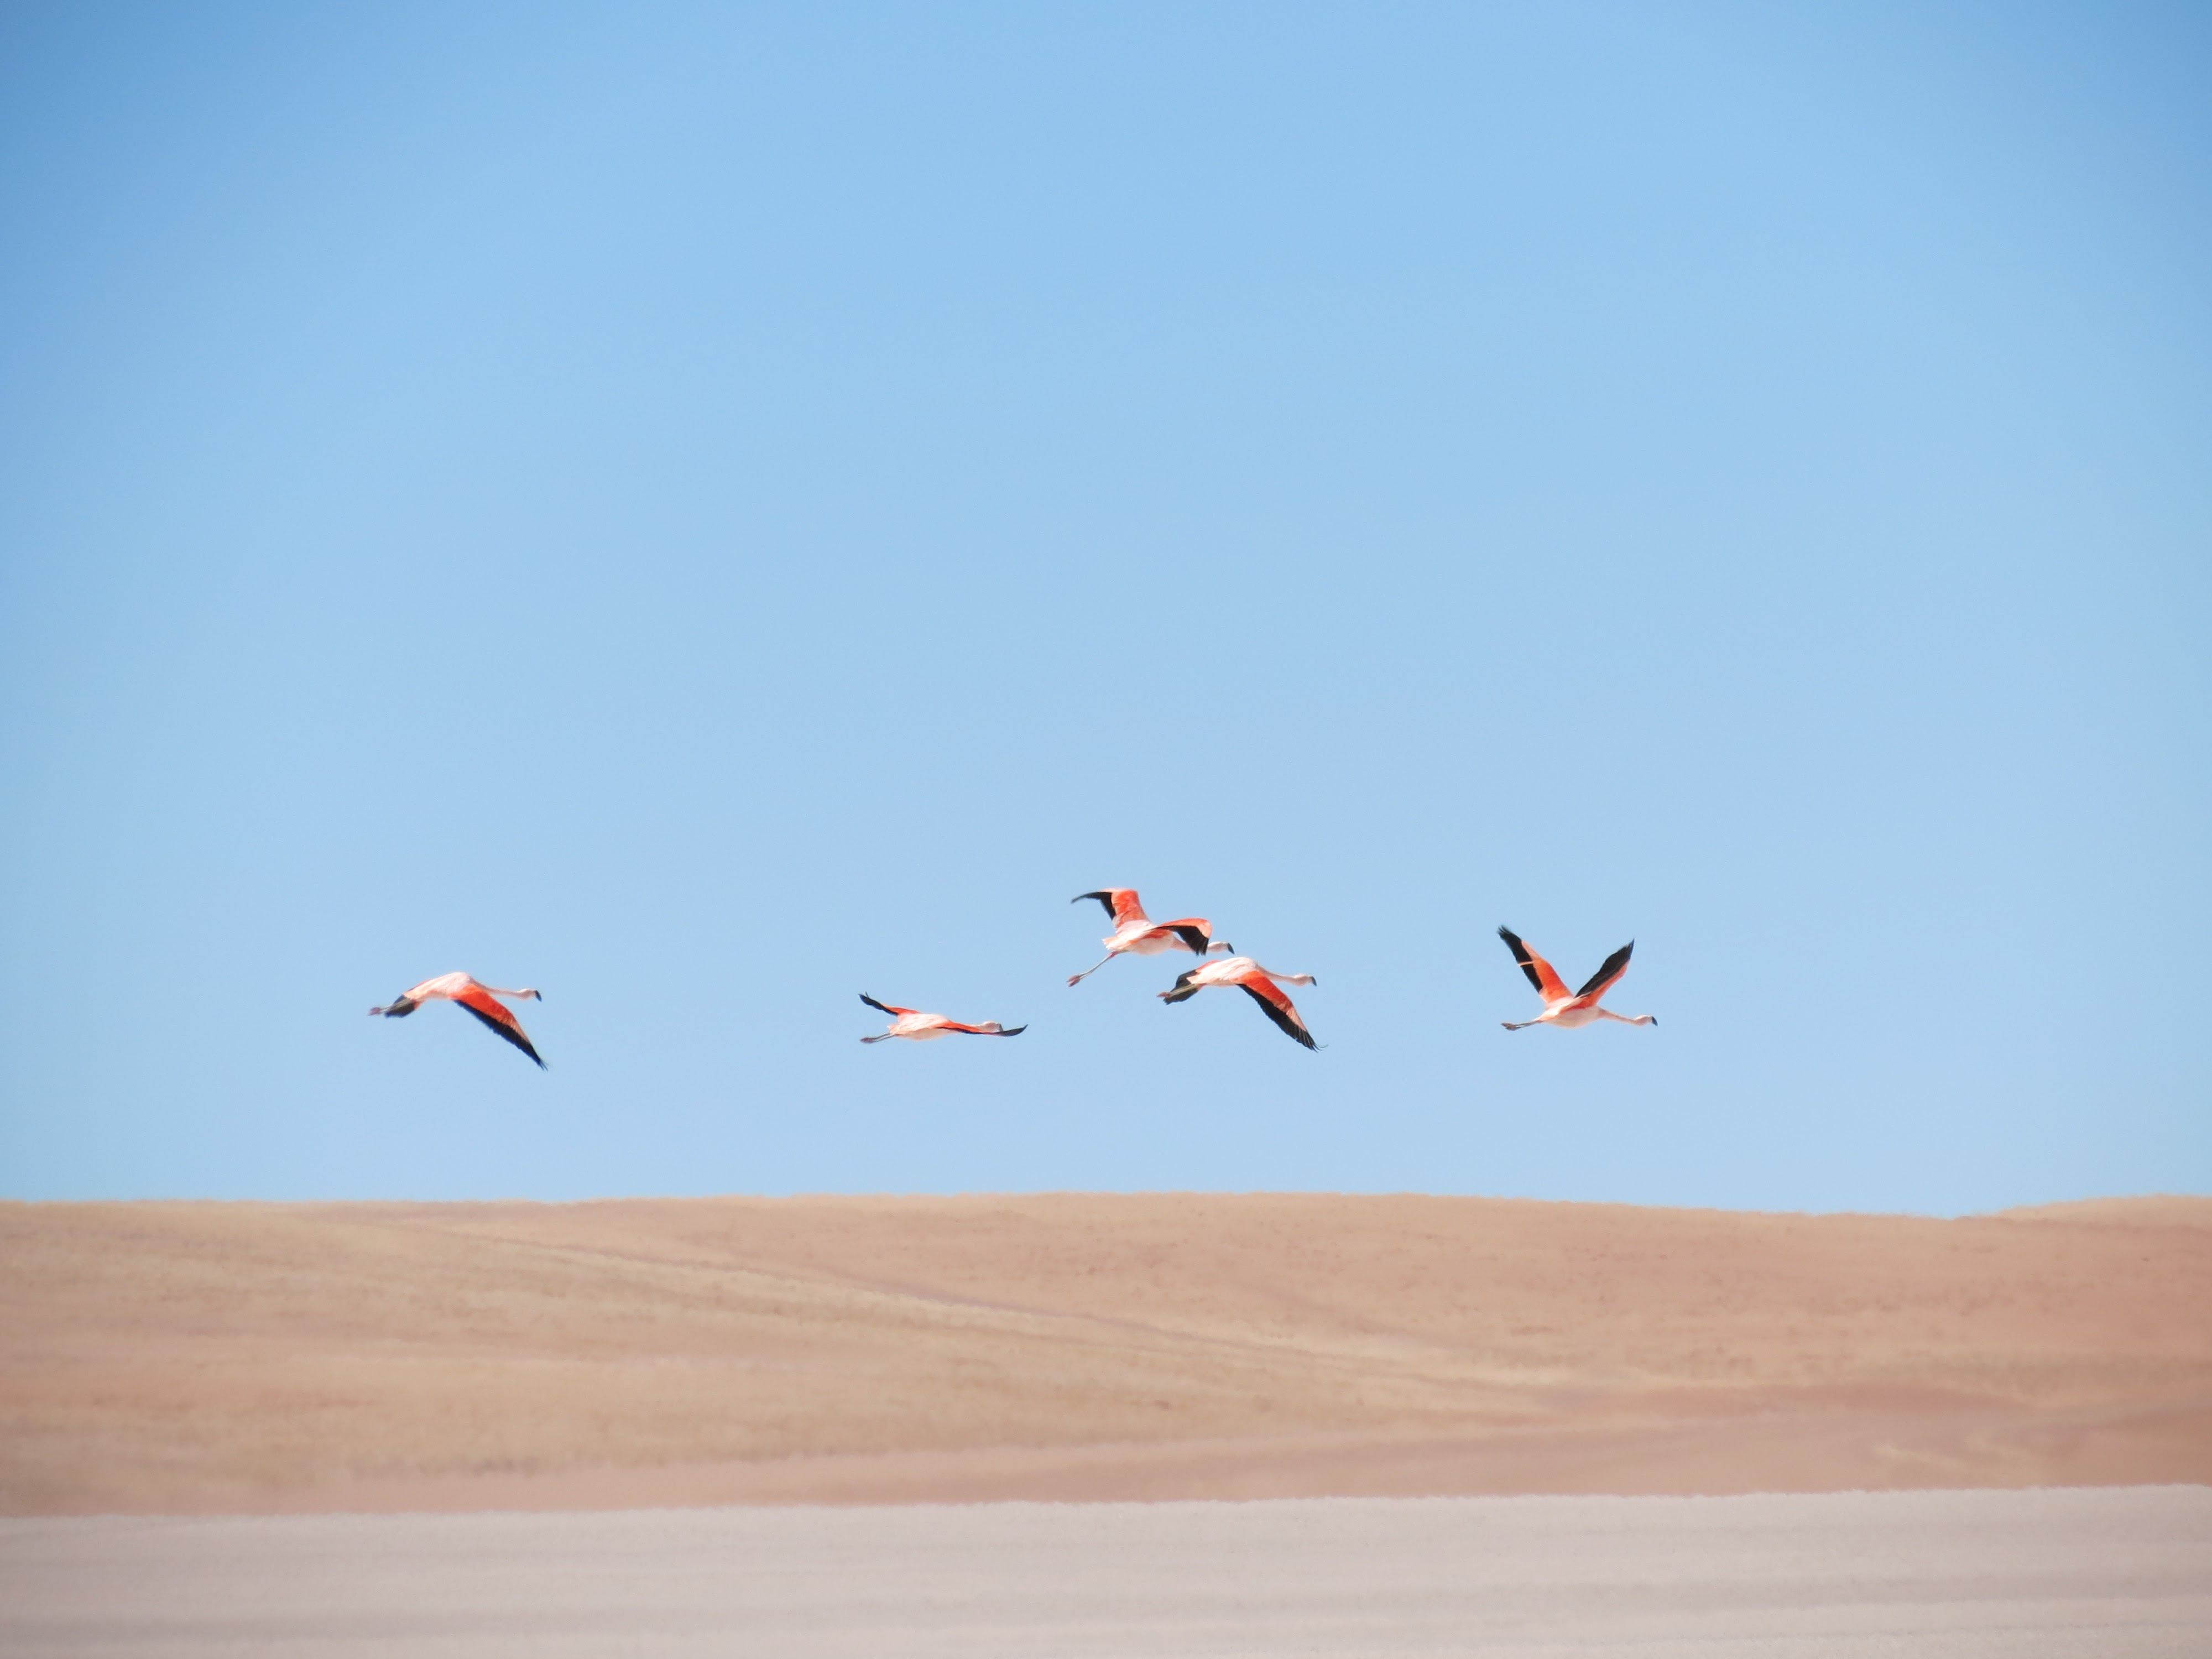 Our excursion from San Pedro De Atacama to Uyuni